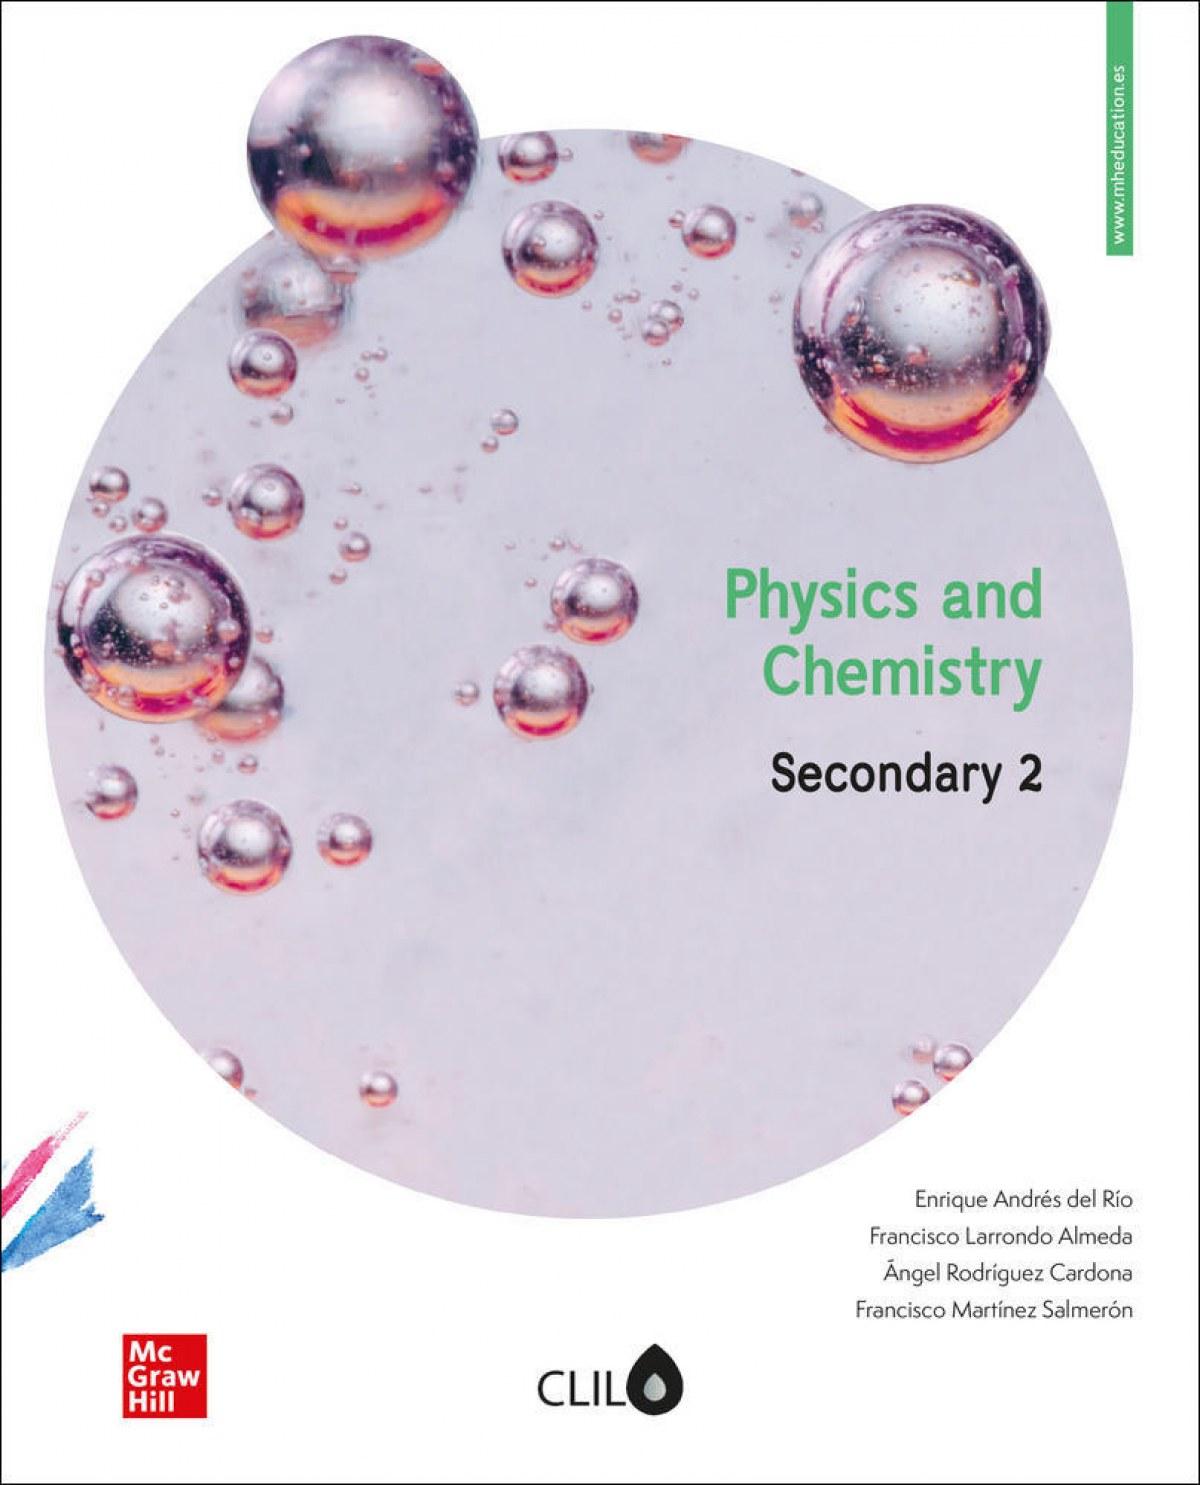 LA Physics and Chemistry 2 ESO